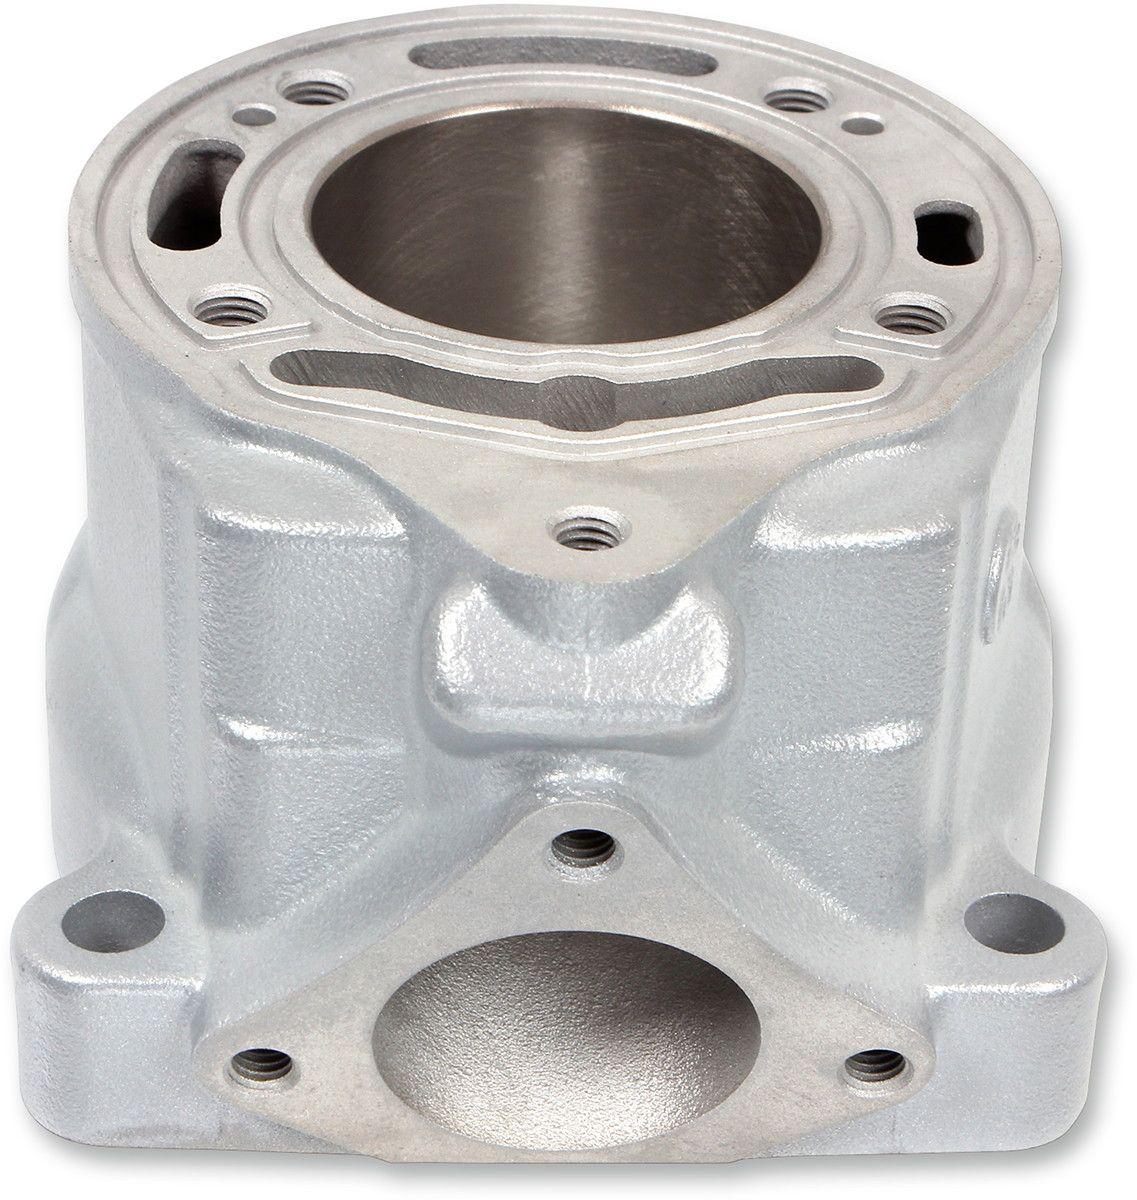 【MOOSE RACING】維修用汽缸 [0931-0514] - 「Webike-摩托百貨」